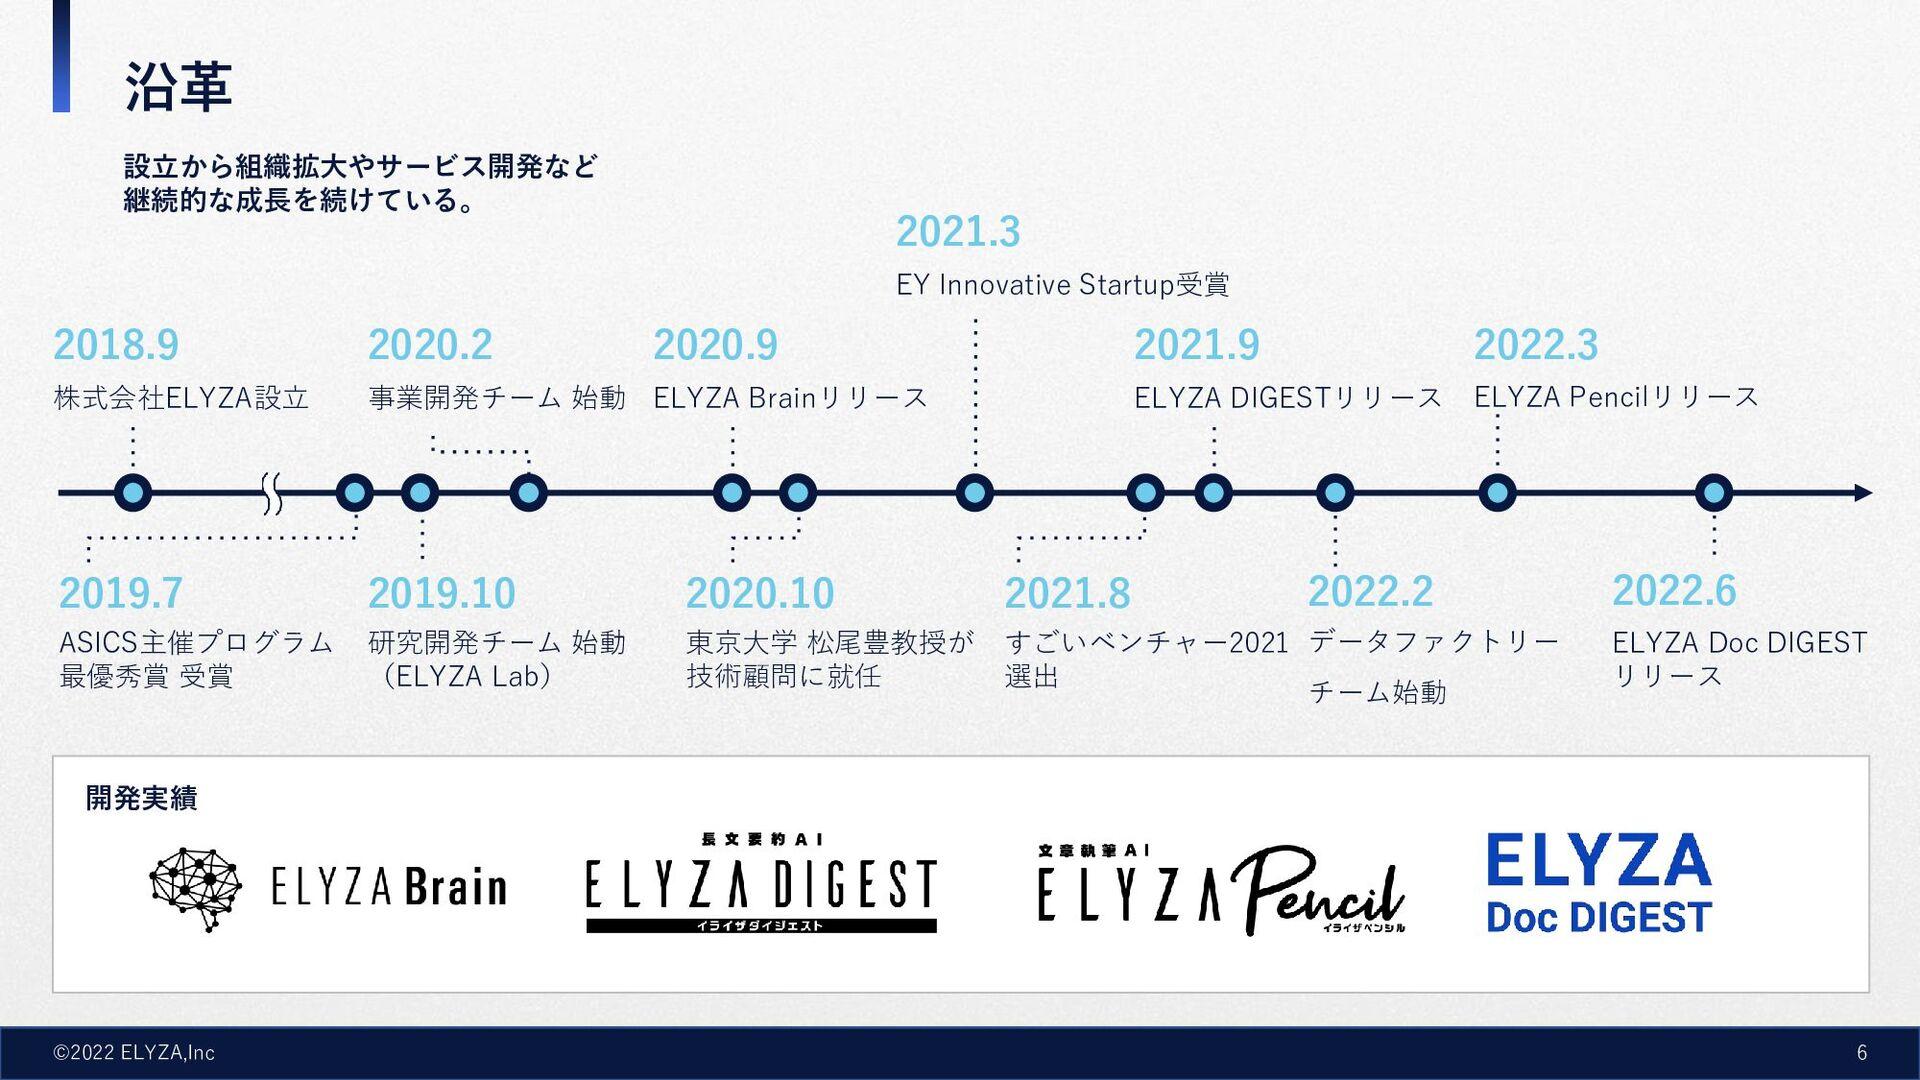 "˜&-:;""*OD MISSION / VISION ઌٕज़Λ࣮͠ɺ ະ౿ͷྖ..."